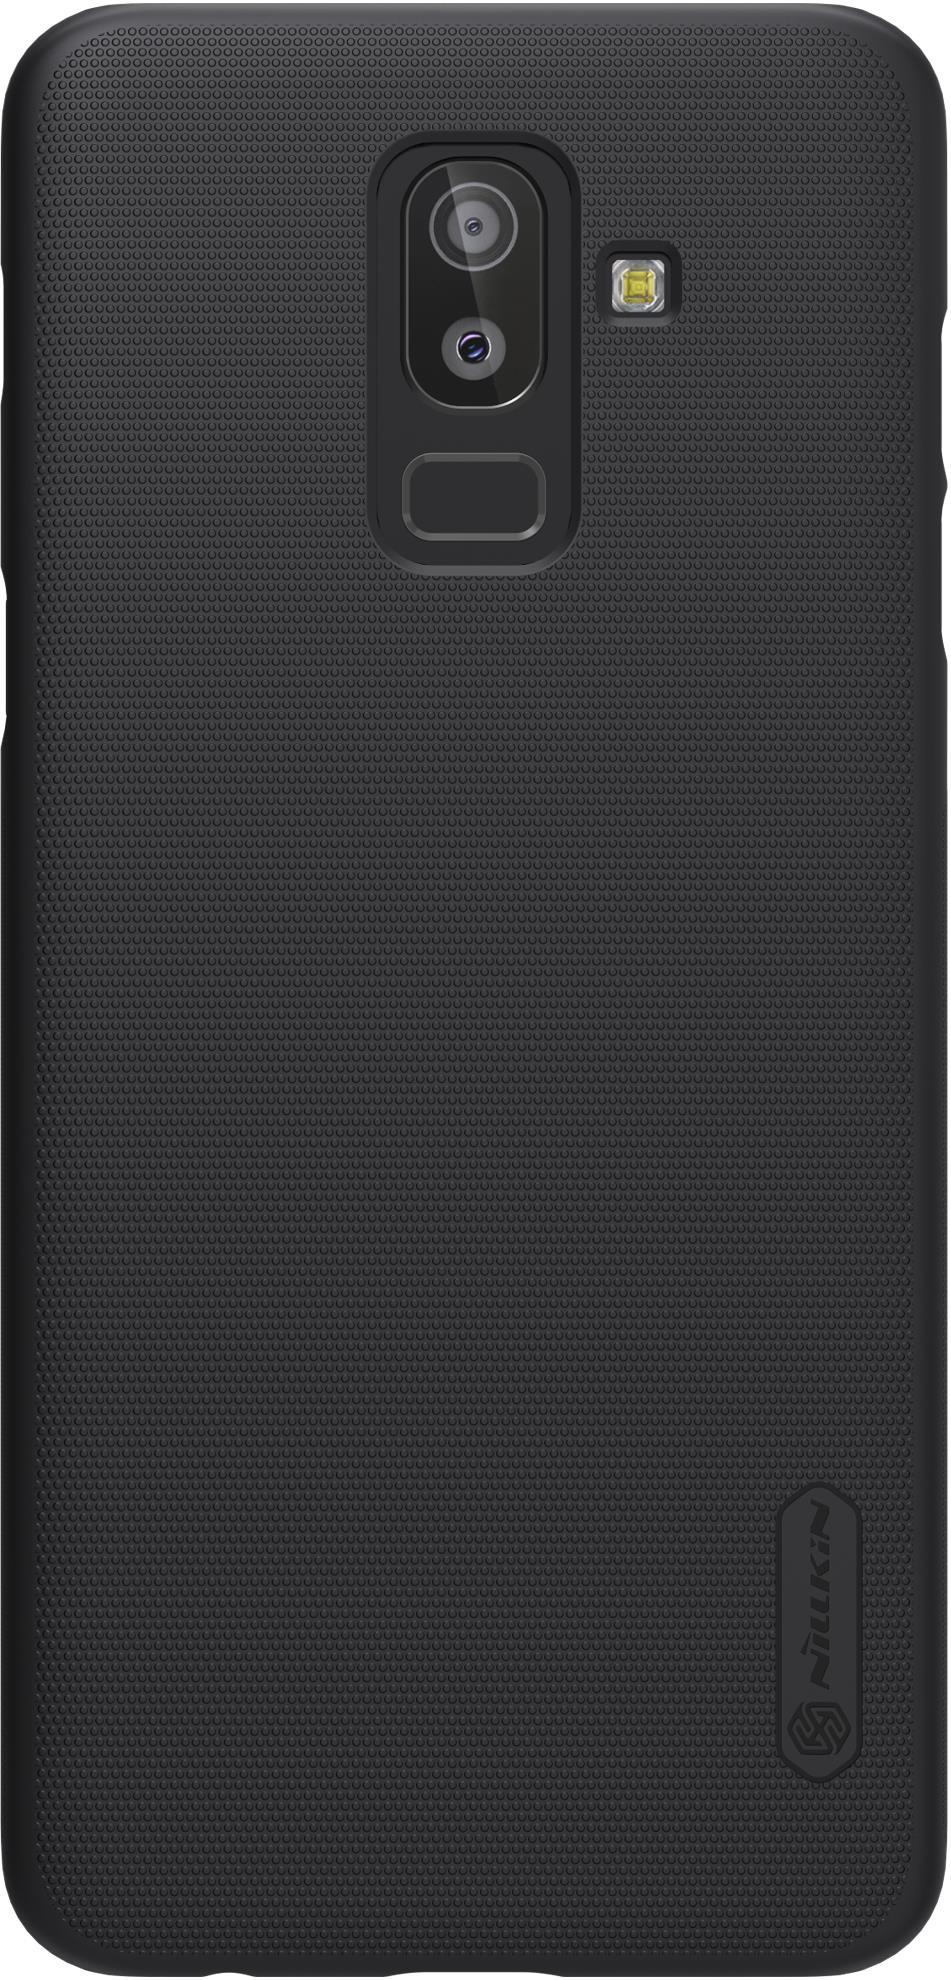 Накладка Nillkin Super Frosted для Galaxy J8, 6902048161306, черный